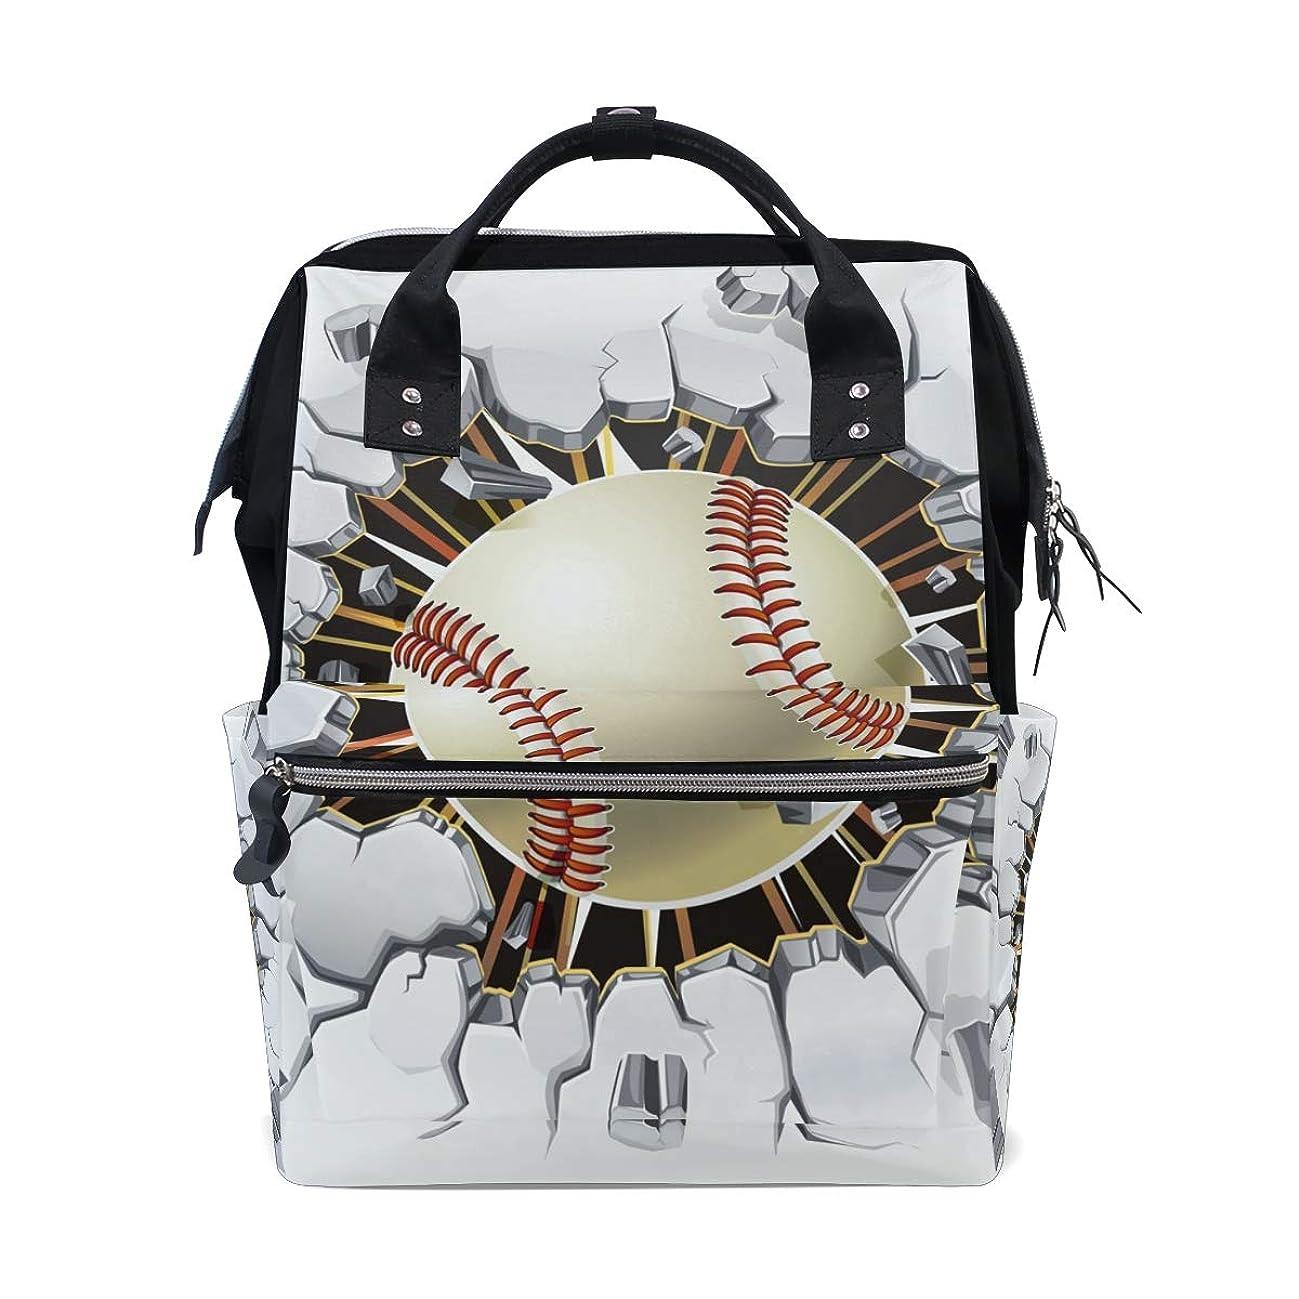 Baseball Broken Wall School Backpack Large Capacity Mummy Bags Laptop Handbag Casual Travel Rucksack Satchel For Women Men Adult Teen Children